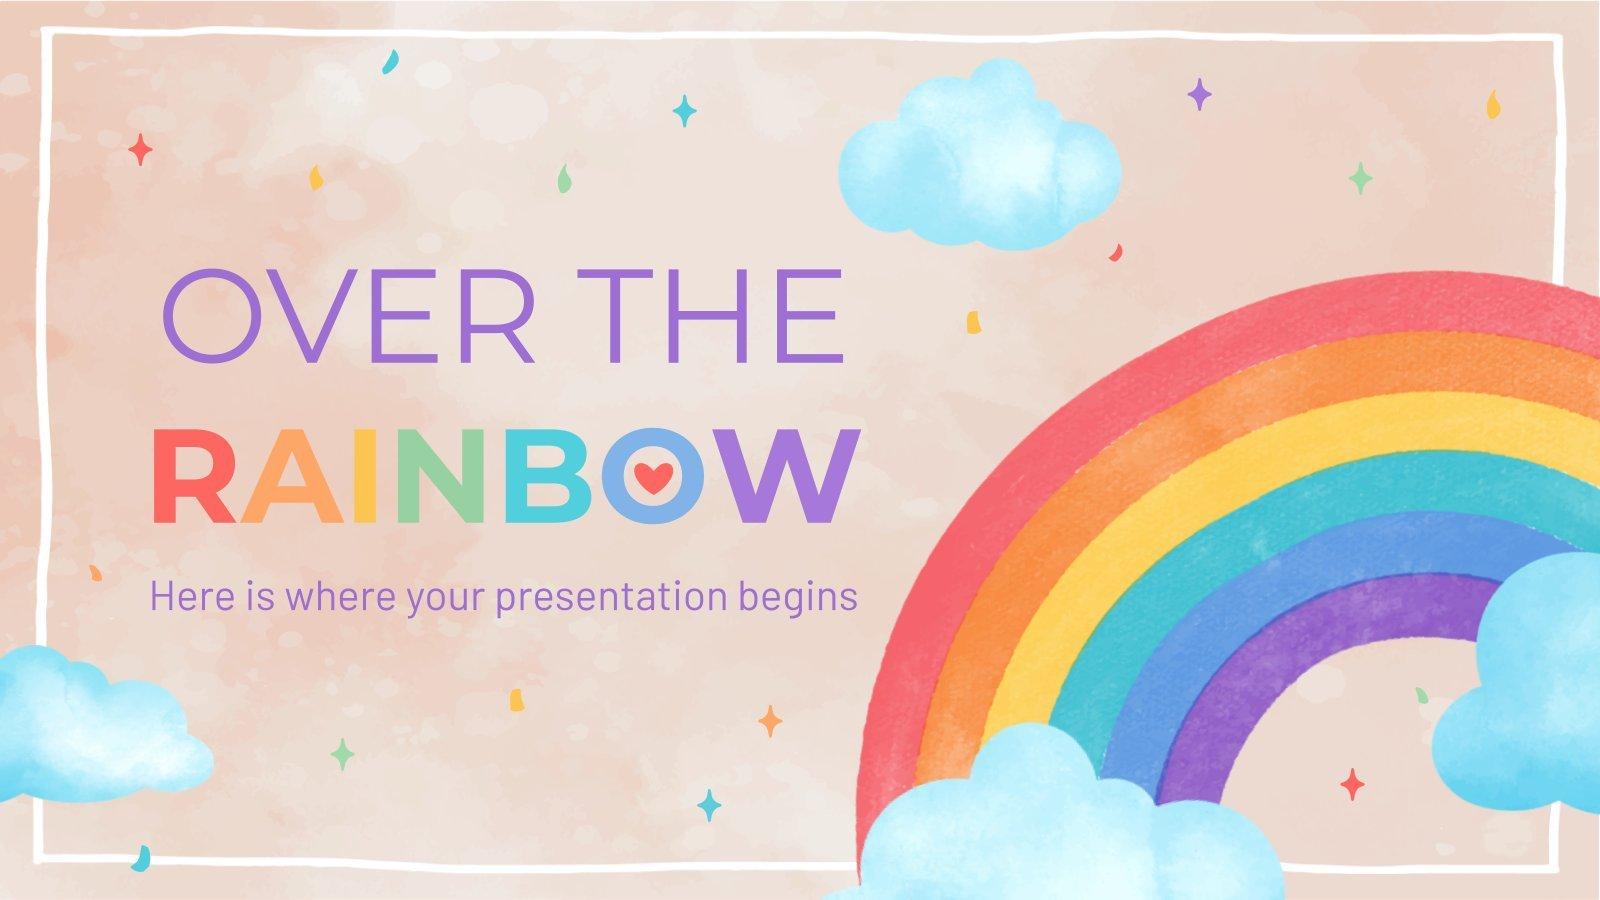 Over the Rainbow presentation template